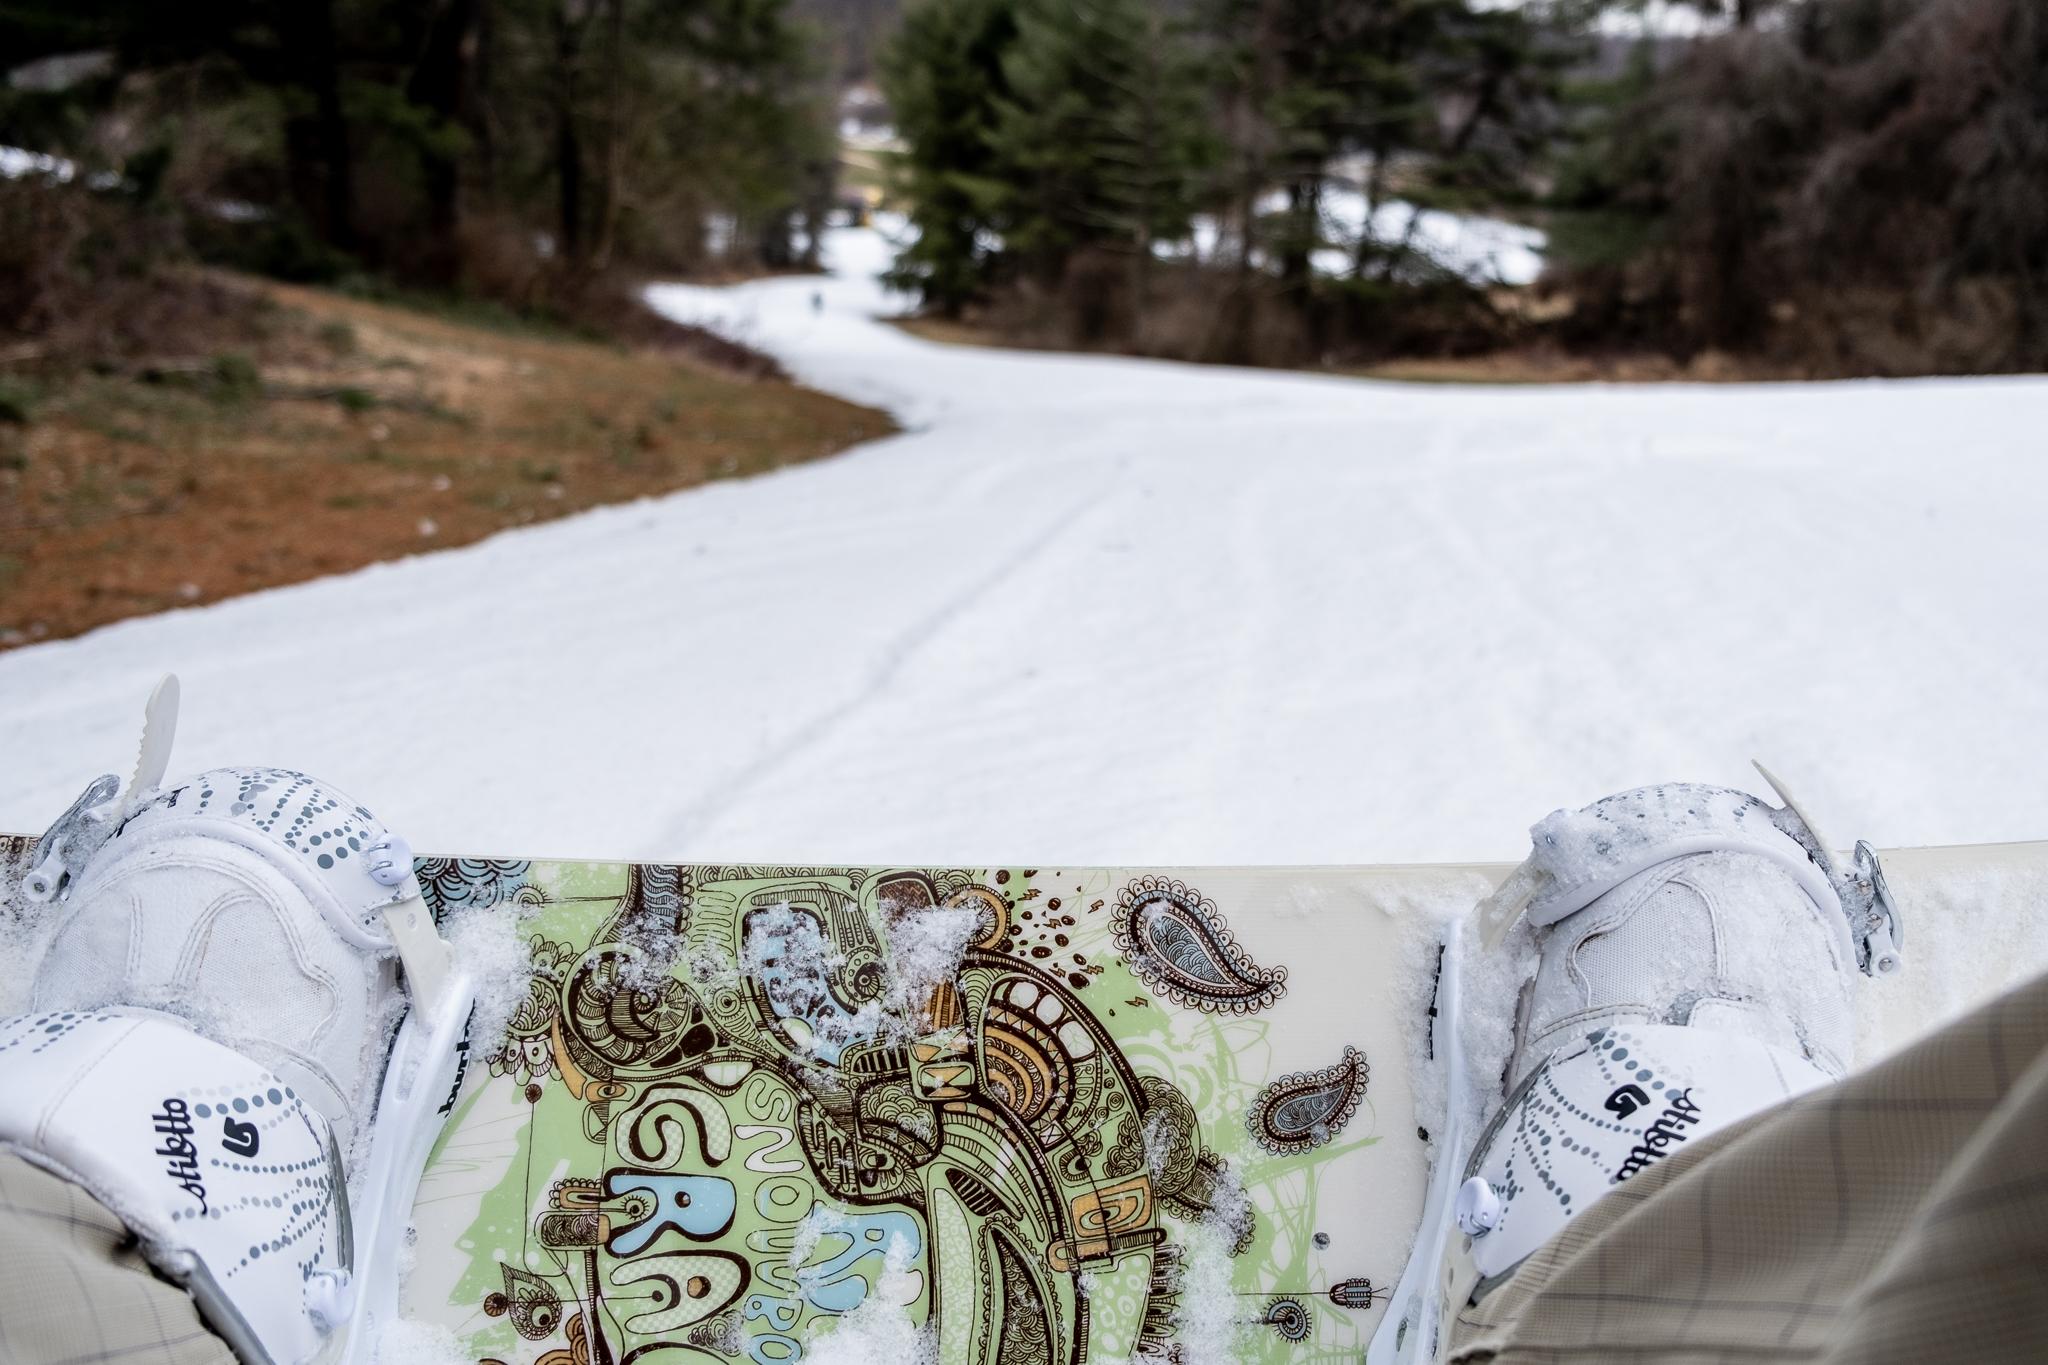 snowboarding at boyce park